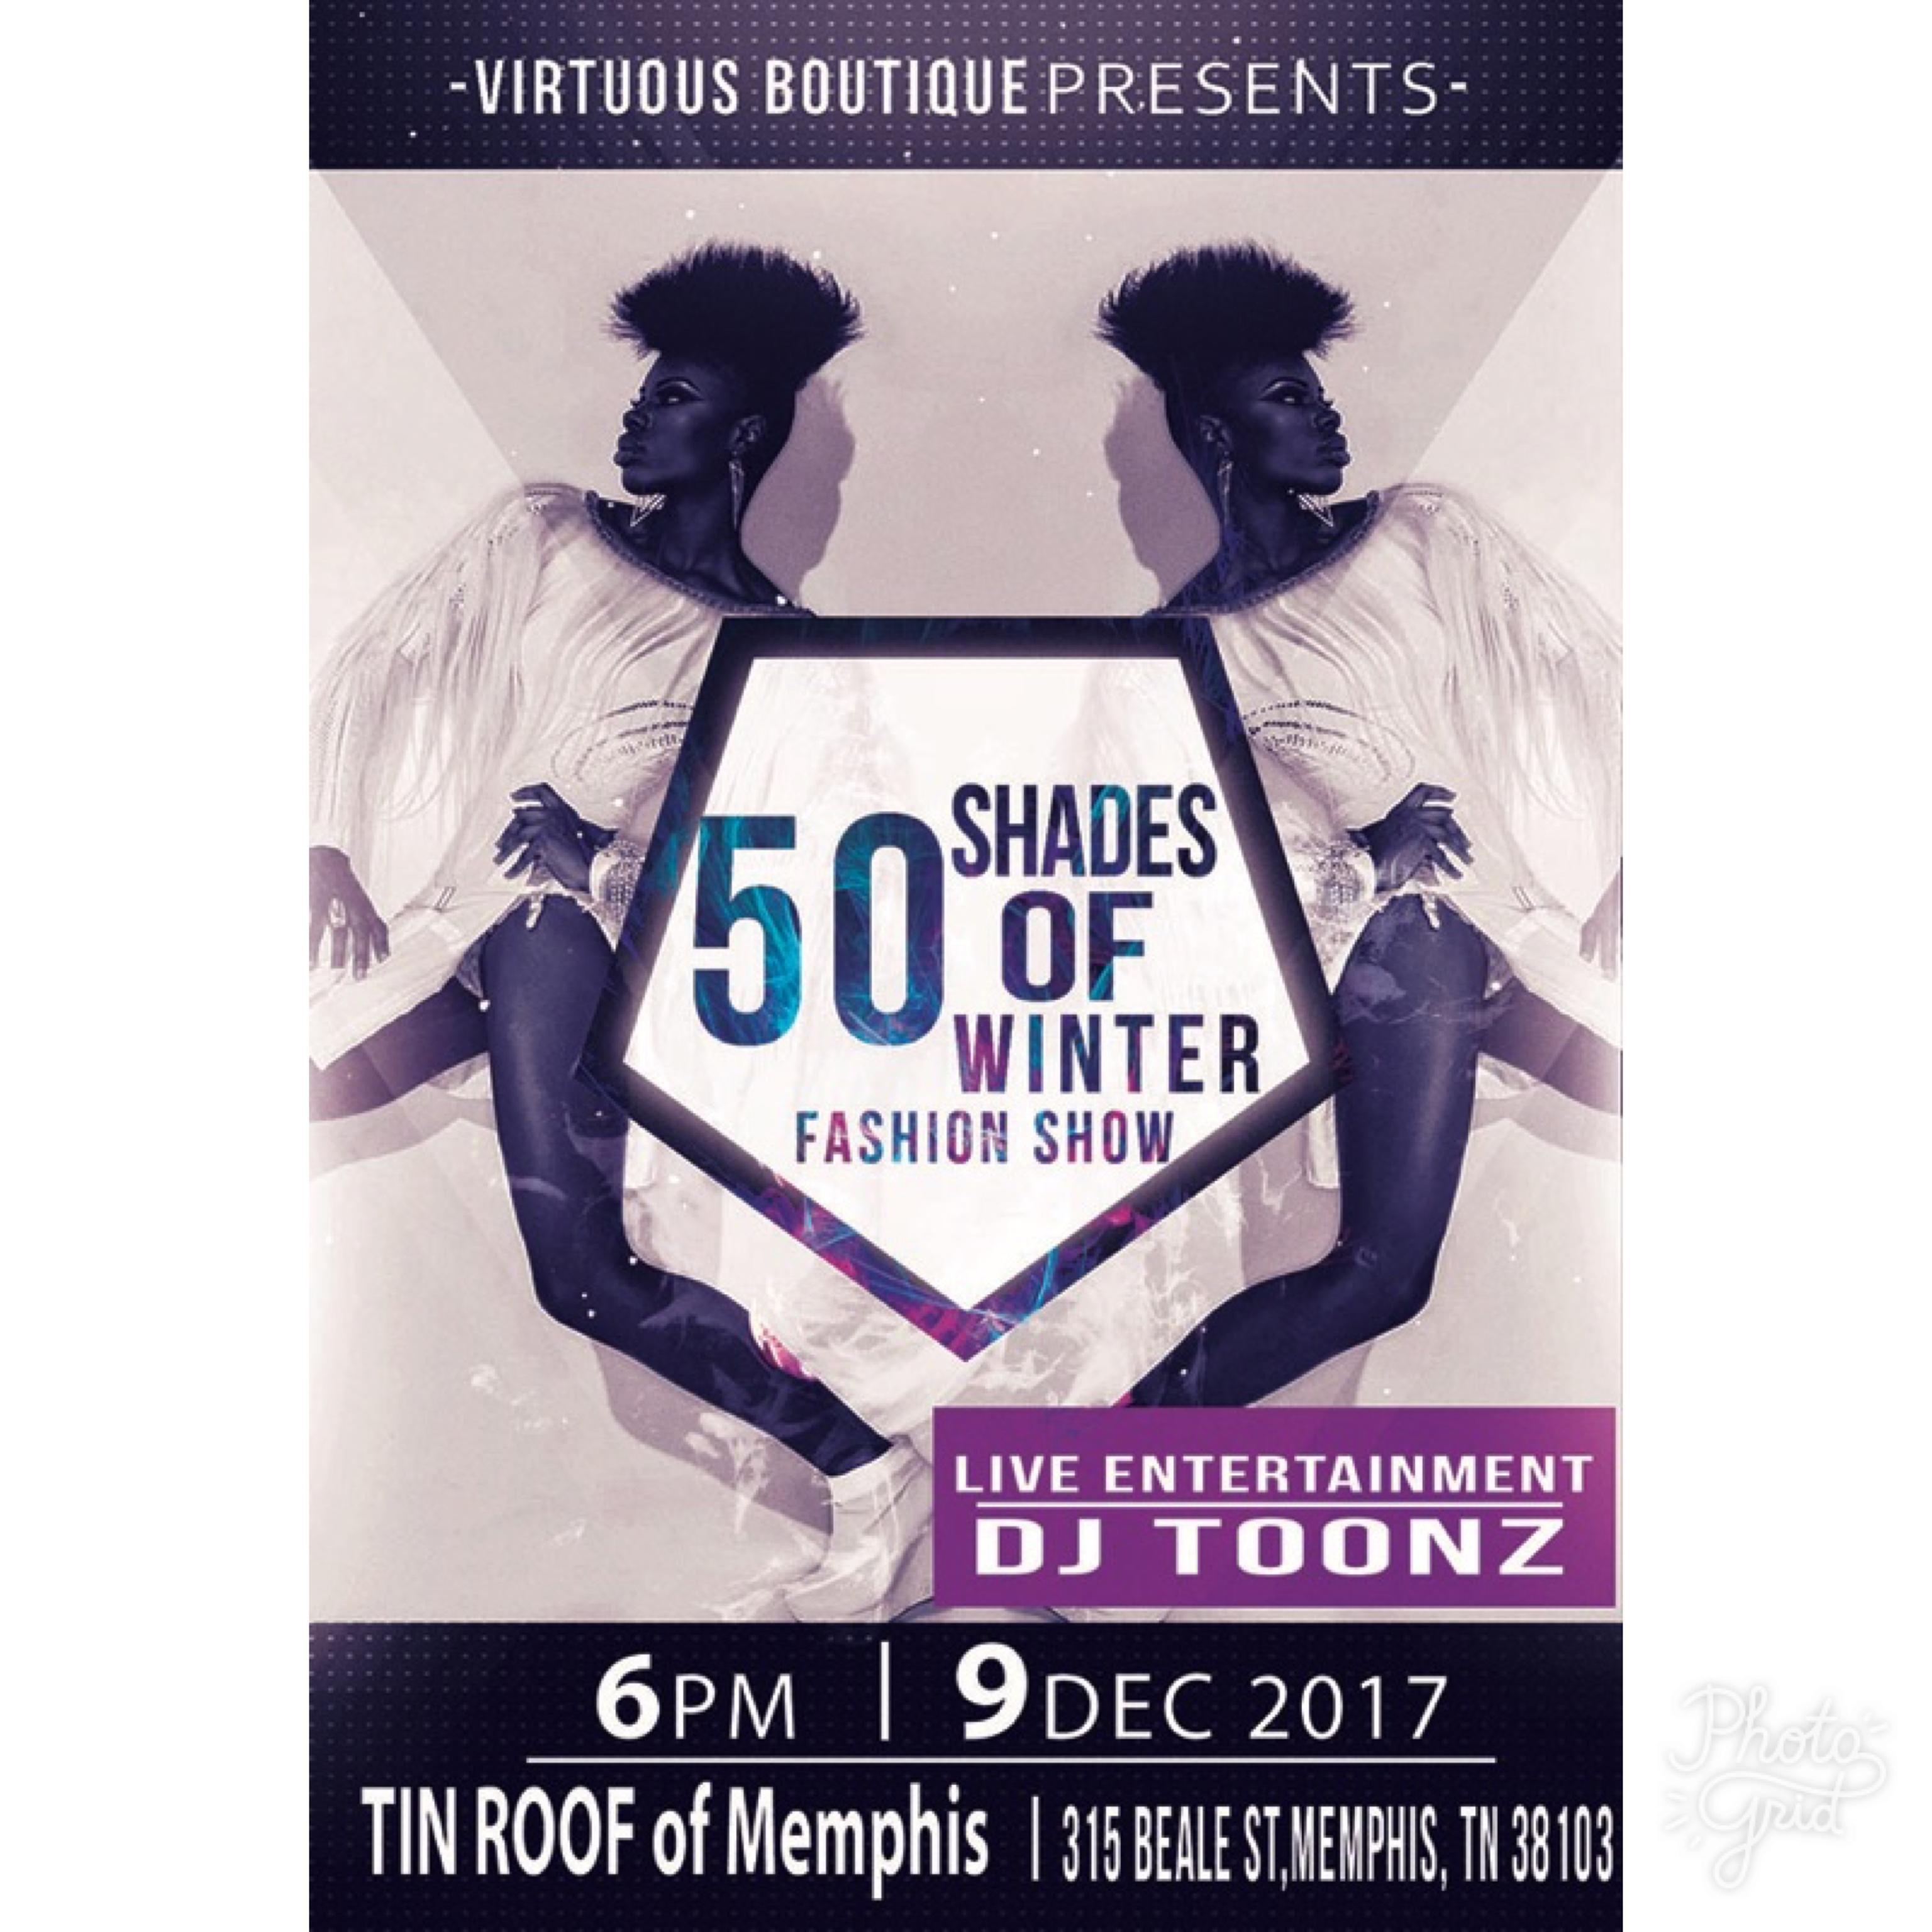 50 Shades of Winter Fashion Show